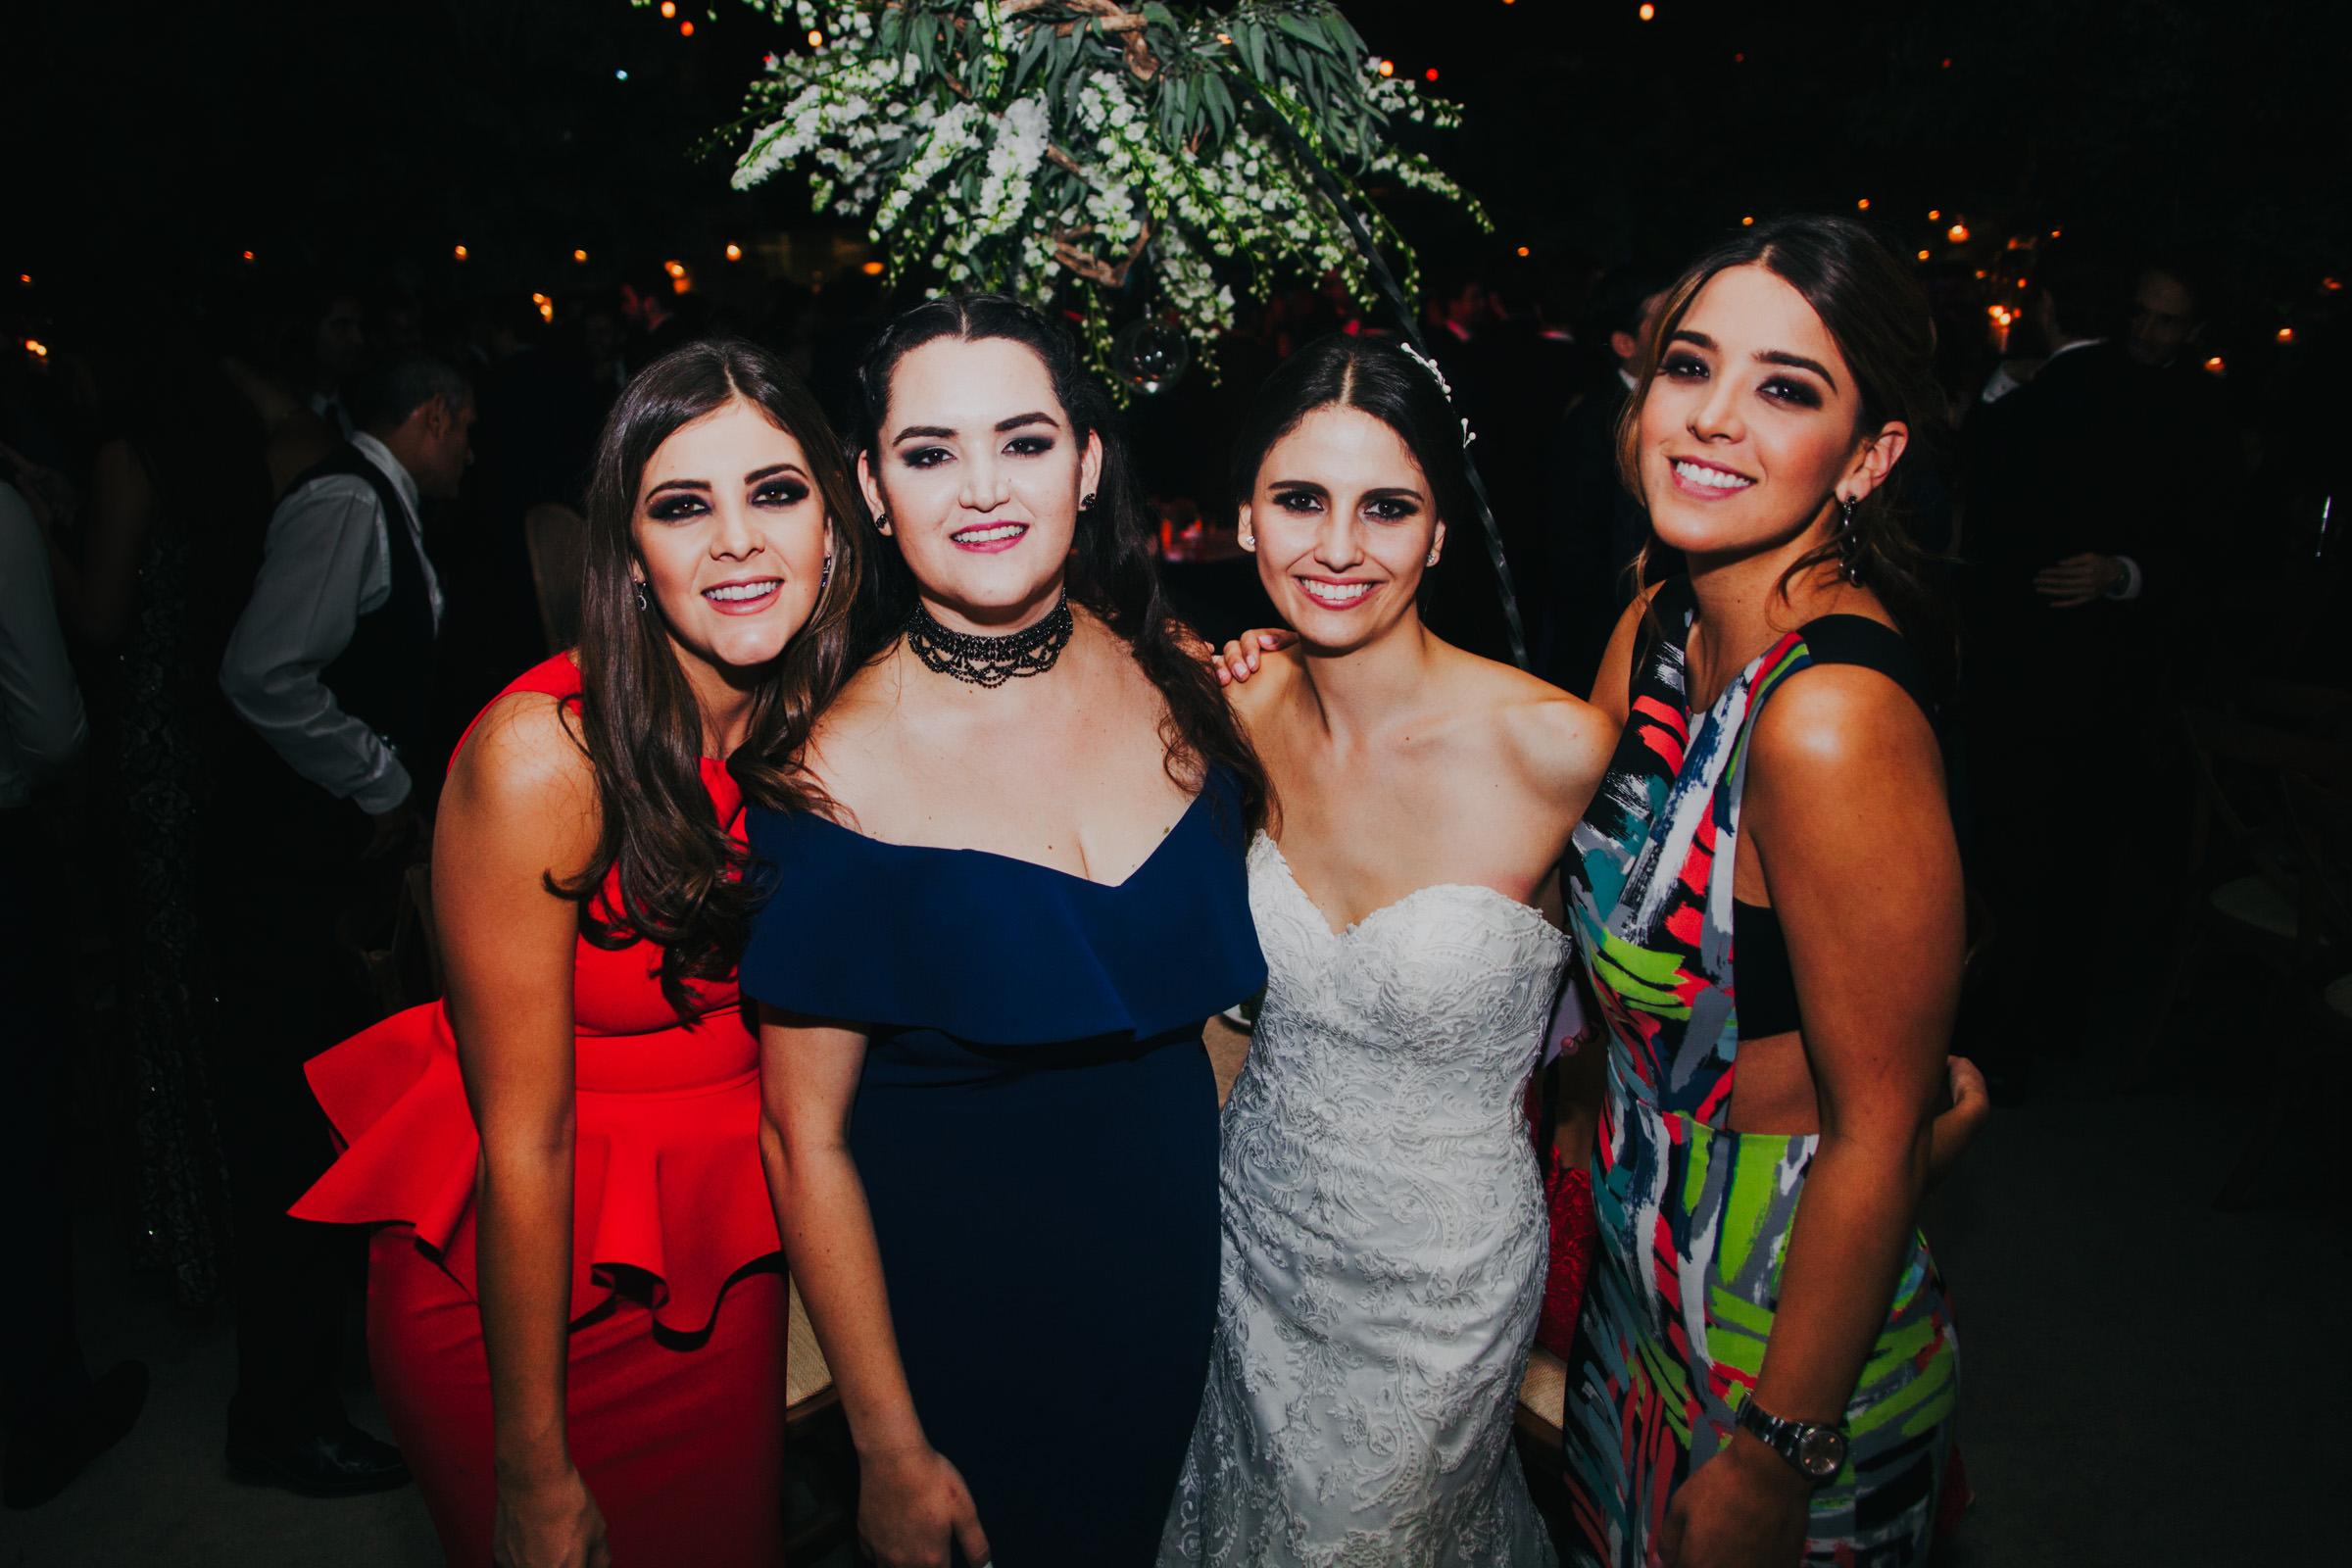 irapuato-boda-fotografia-jardines-alcalde-guanajuato-paulina-juan-pedro--166.jpg